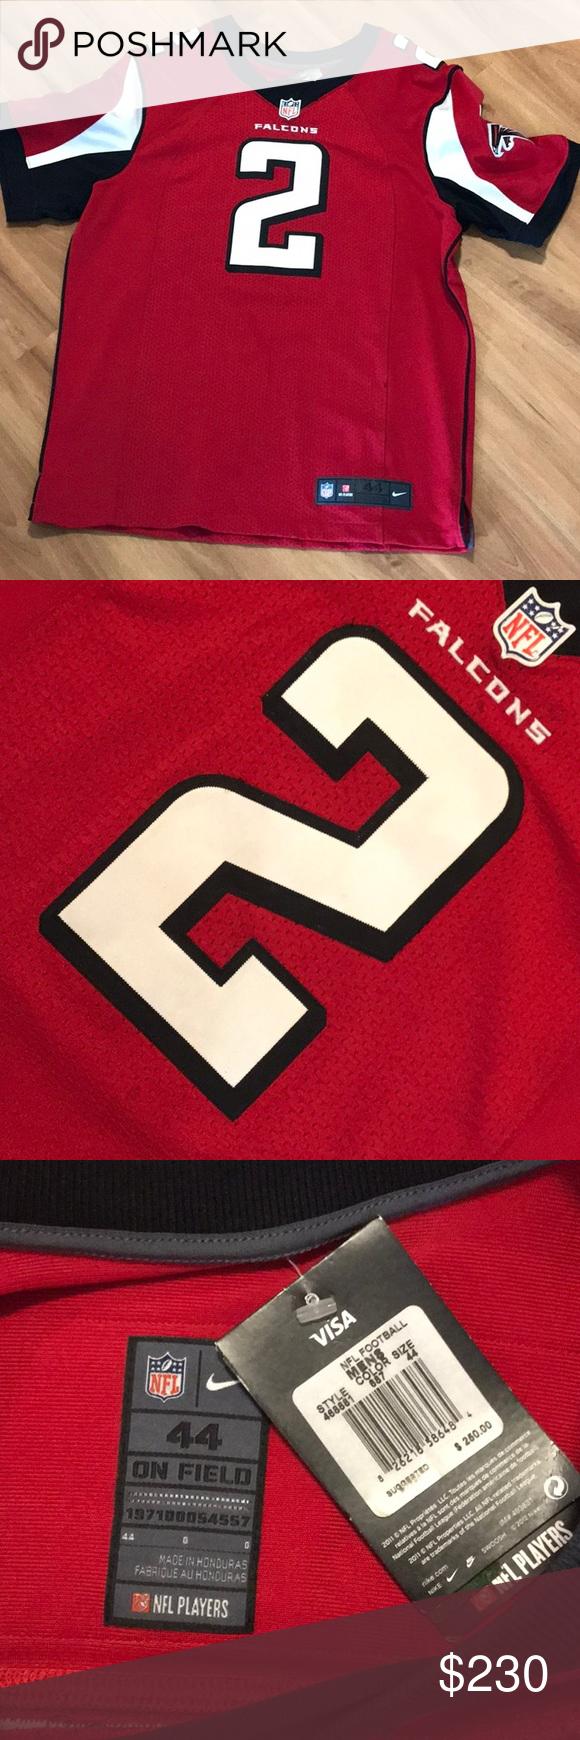 huge discount 533de 8503d Atlanta Falcons Jersey Matt Ryan Authentic Tackle twill Nike ...